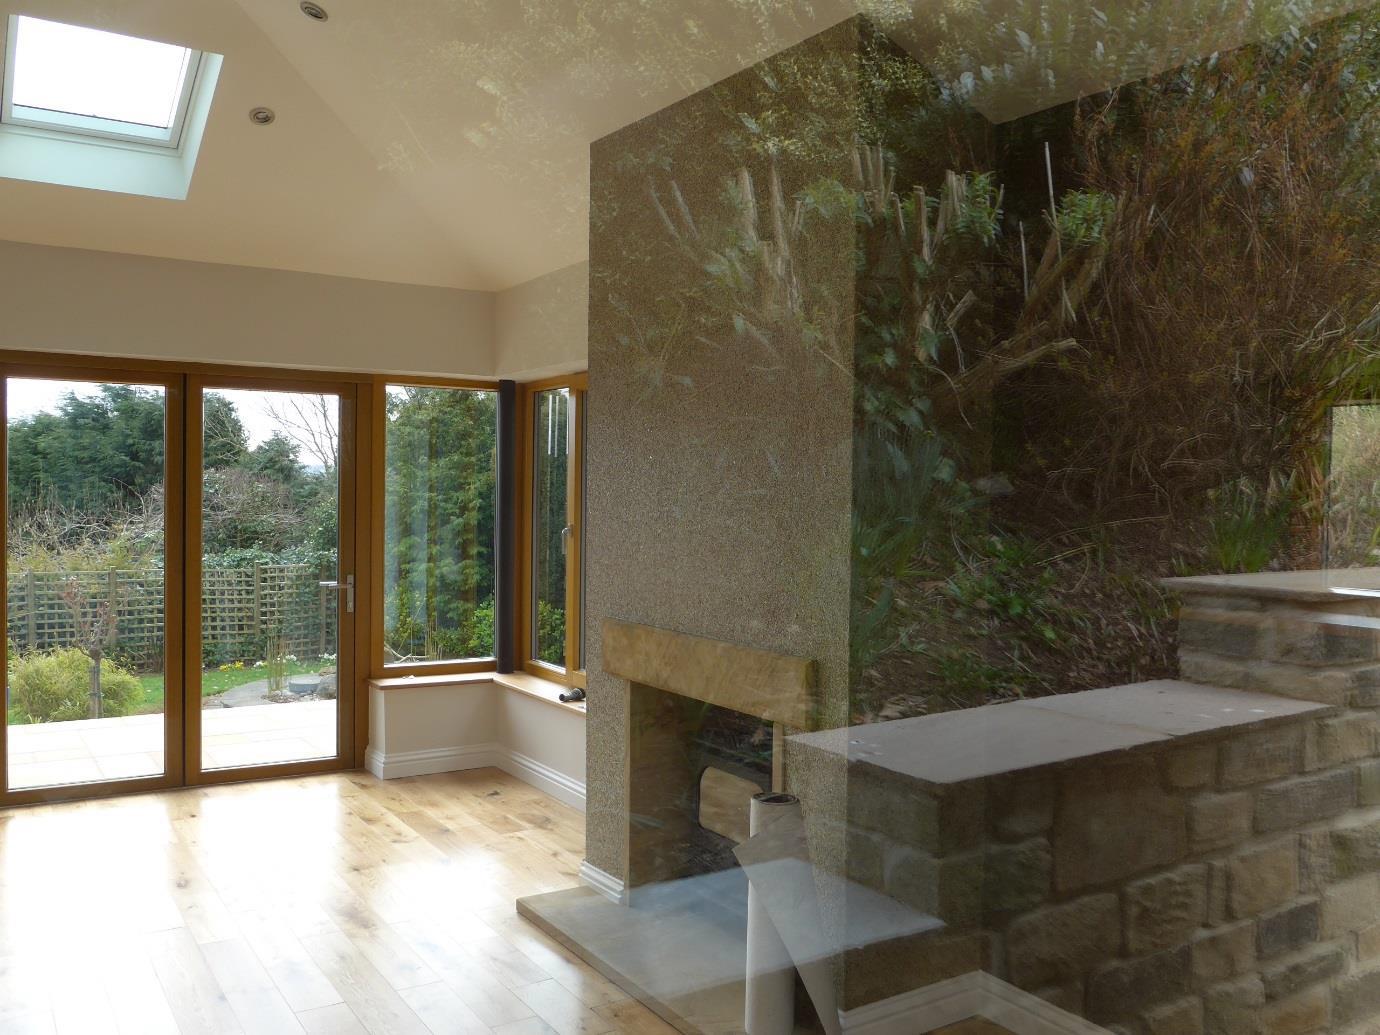 woodlawn interior